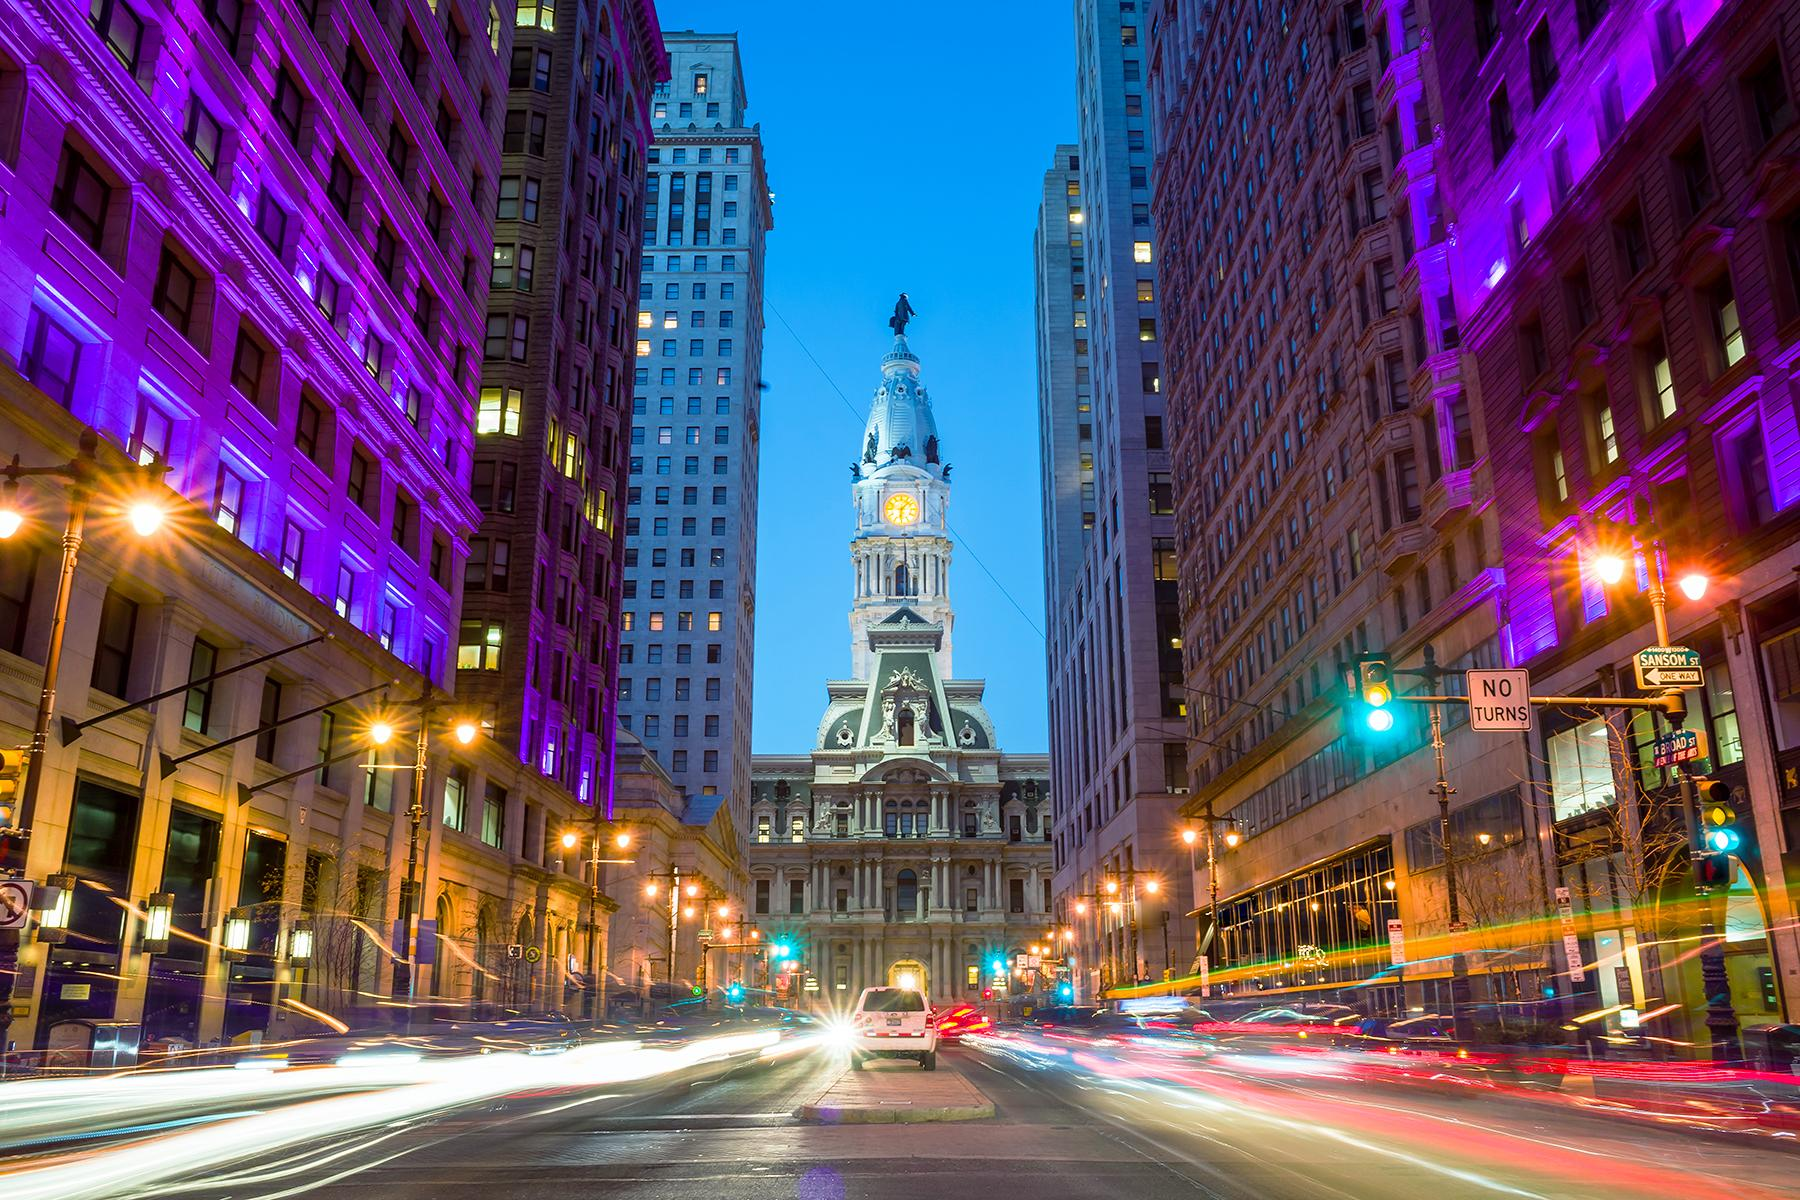 19_20USPlacestoSeeBeforeYouDie__PhiladelphiaCityHall_shutterstock_179729612